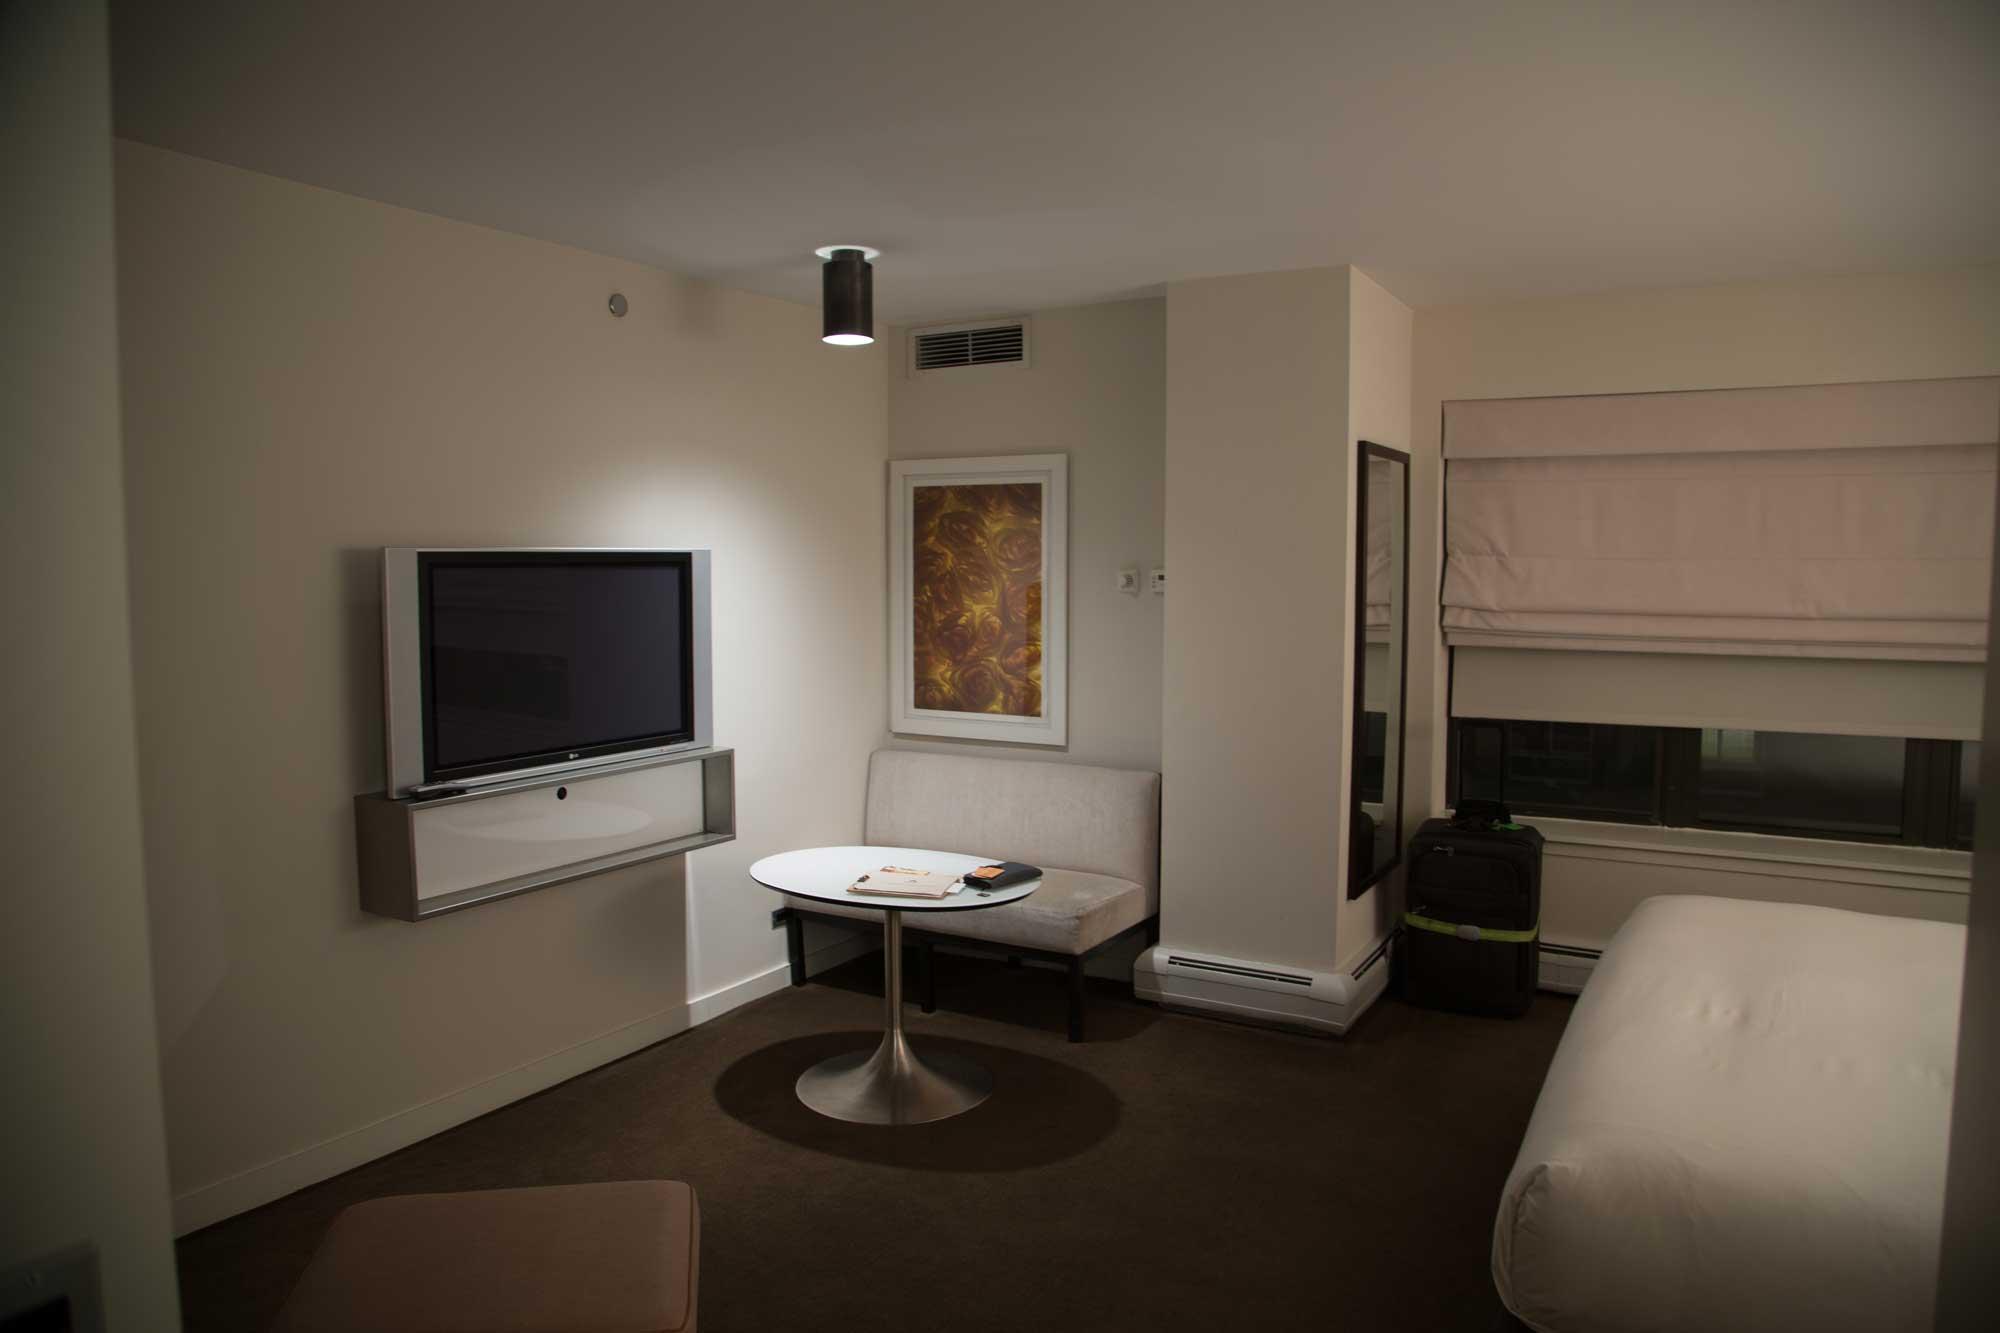 The-James-Hotel-Chicago-2.jpg